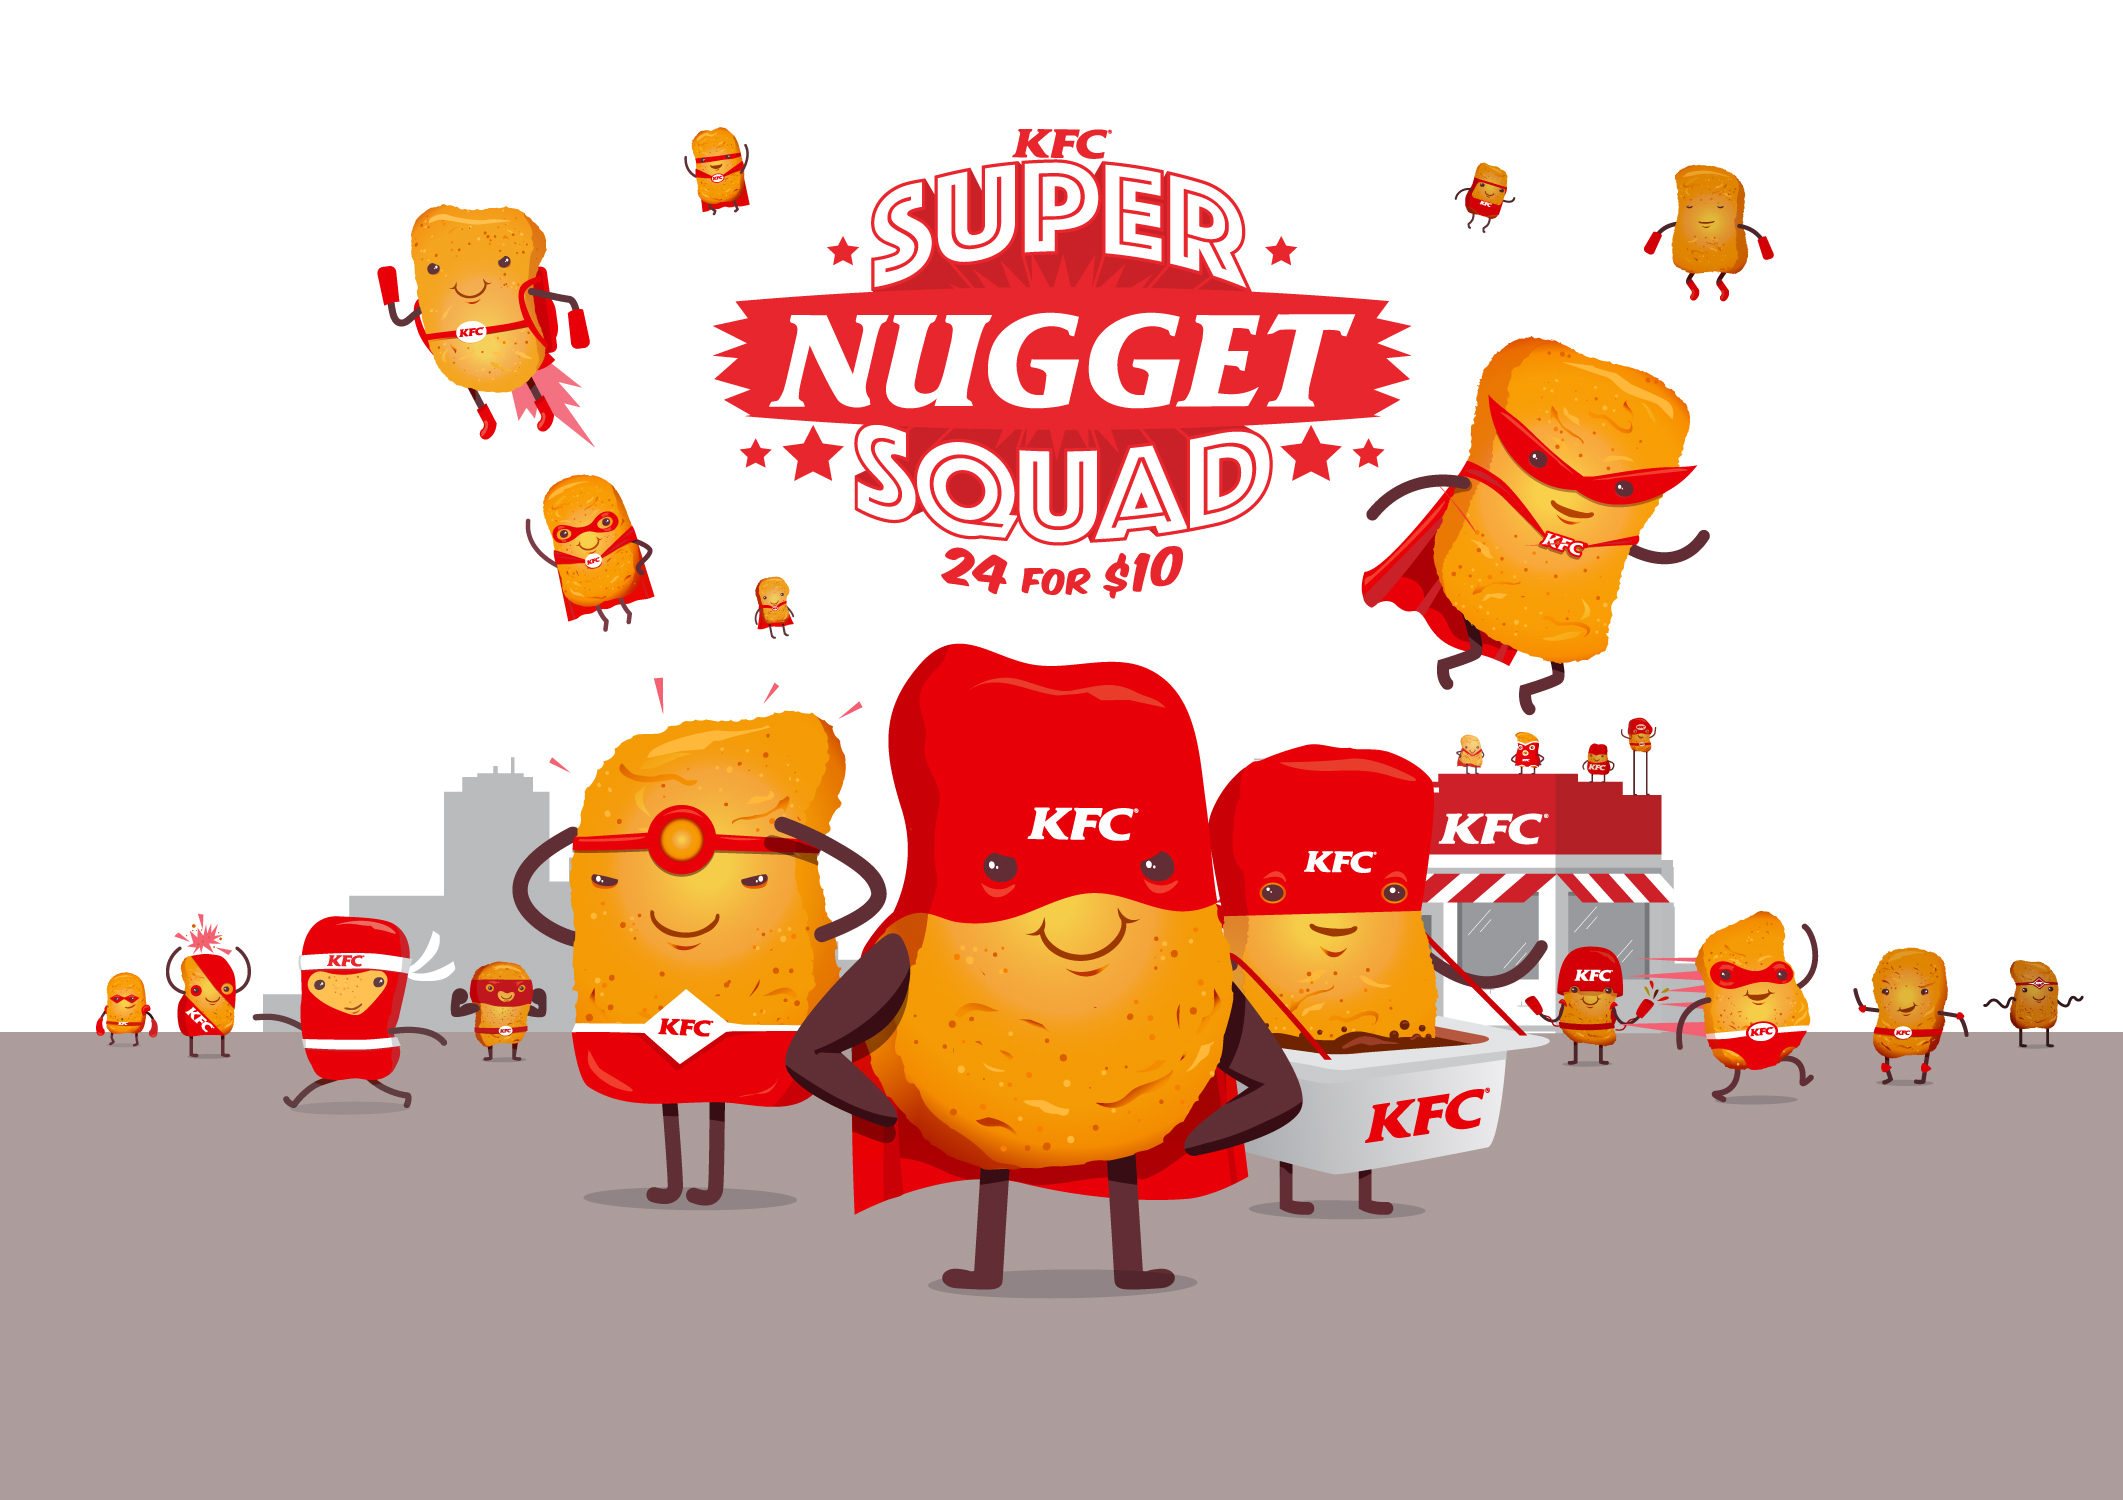 KFC-scene-1-expanded.jpg